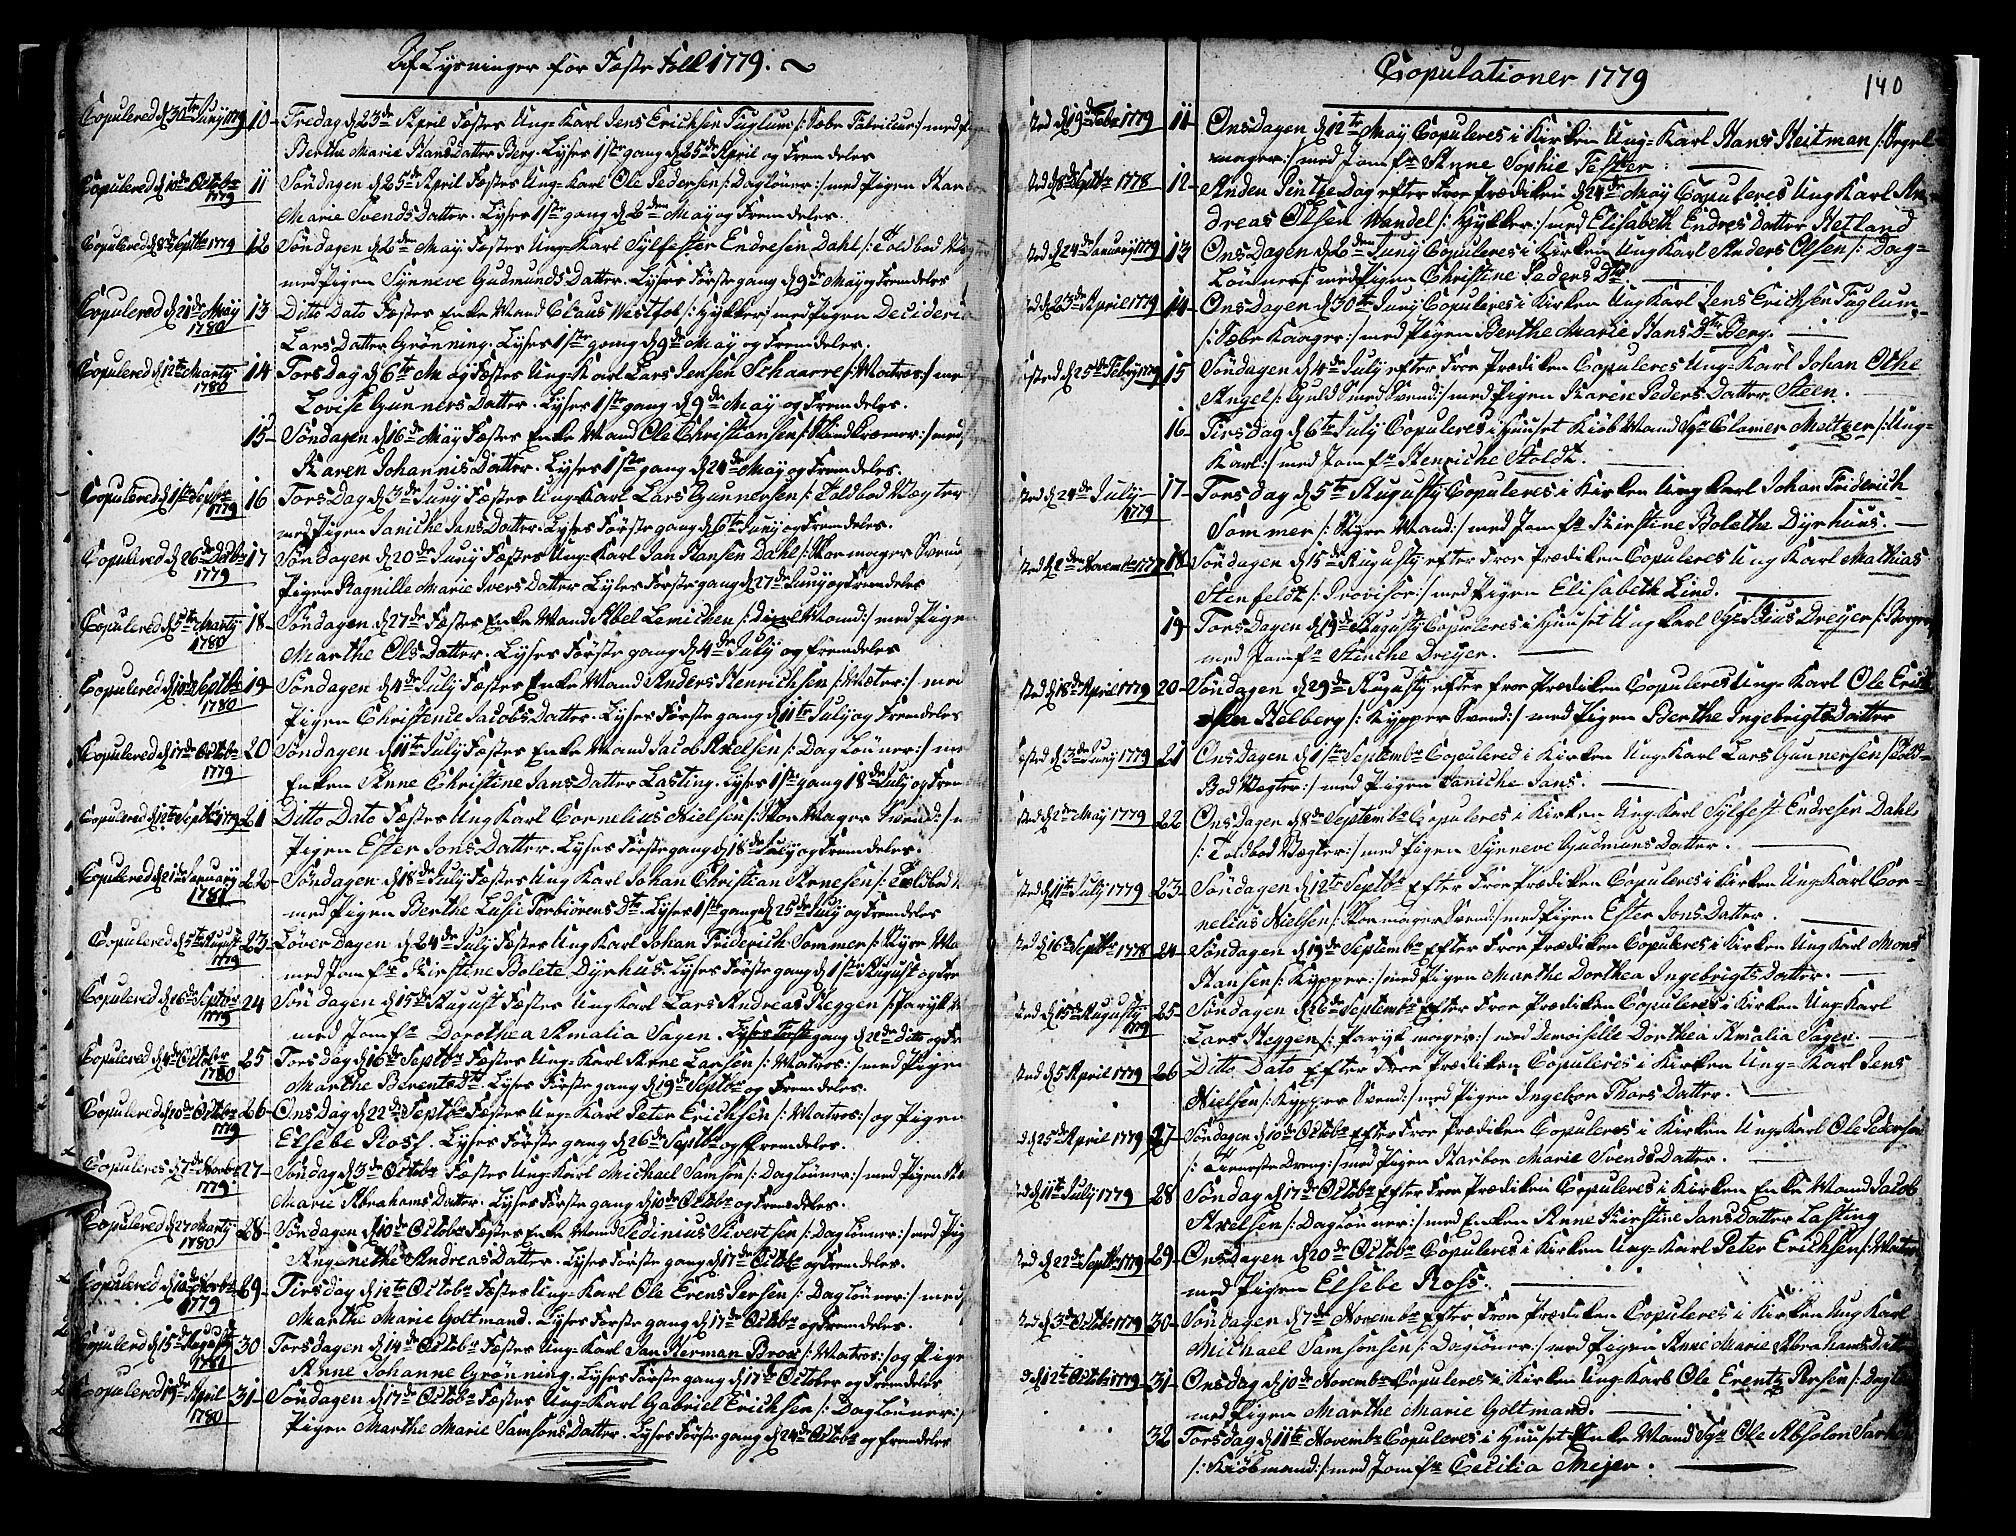 SAB, Nykirken Sokneprestembete, H/Haa: Ministerialbok nr. A 7, 1719-1781, s. 140